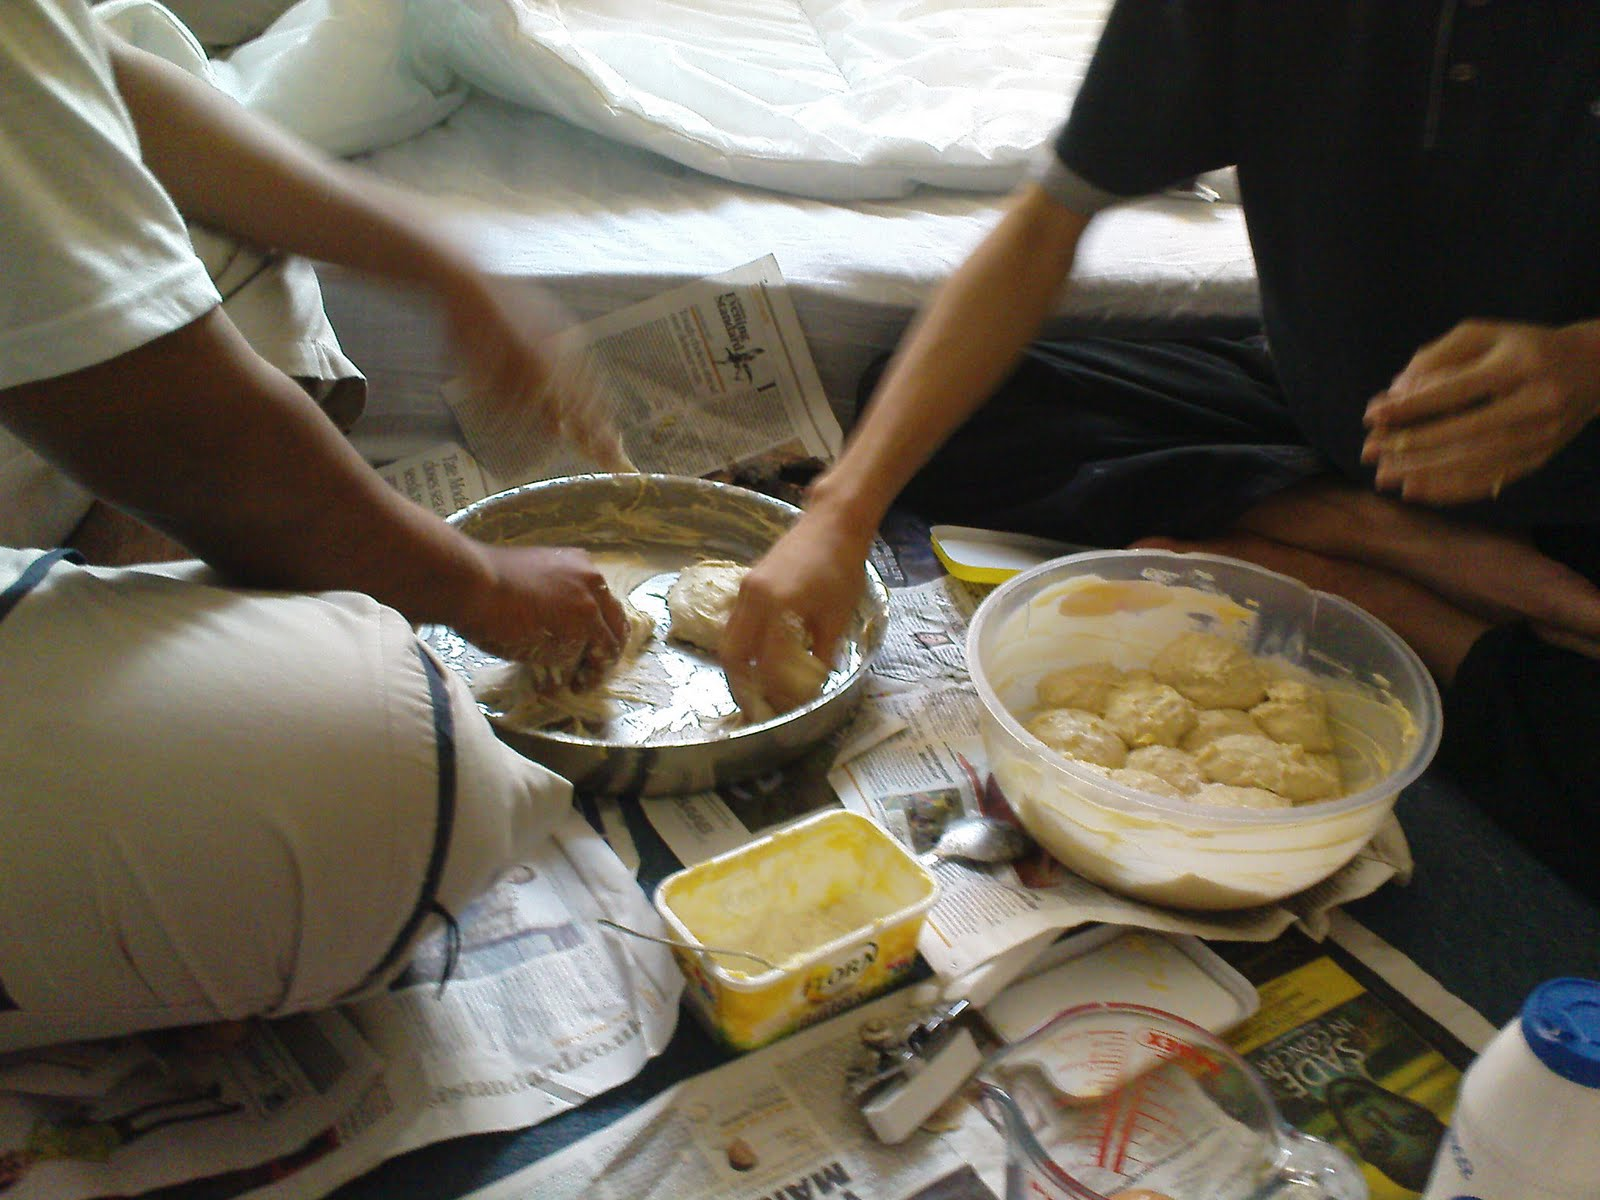 Resepi Roti Canai Gulung